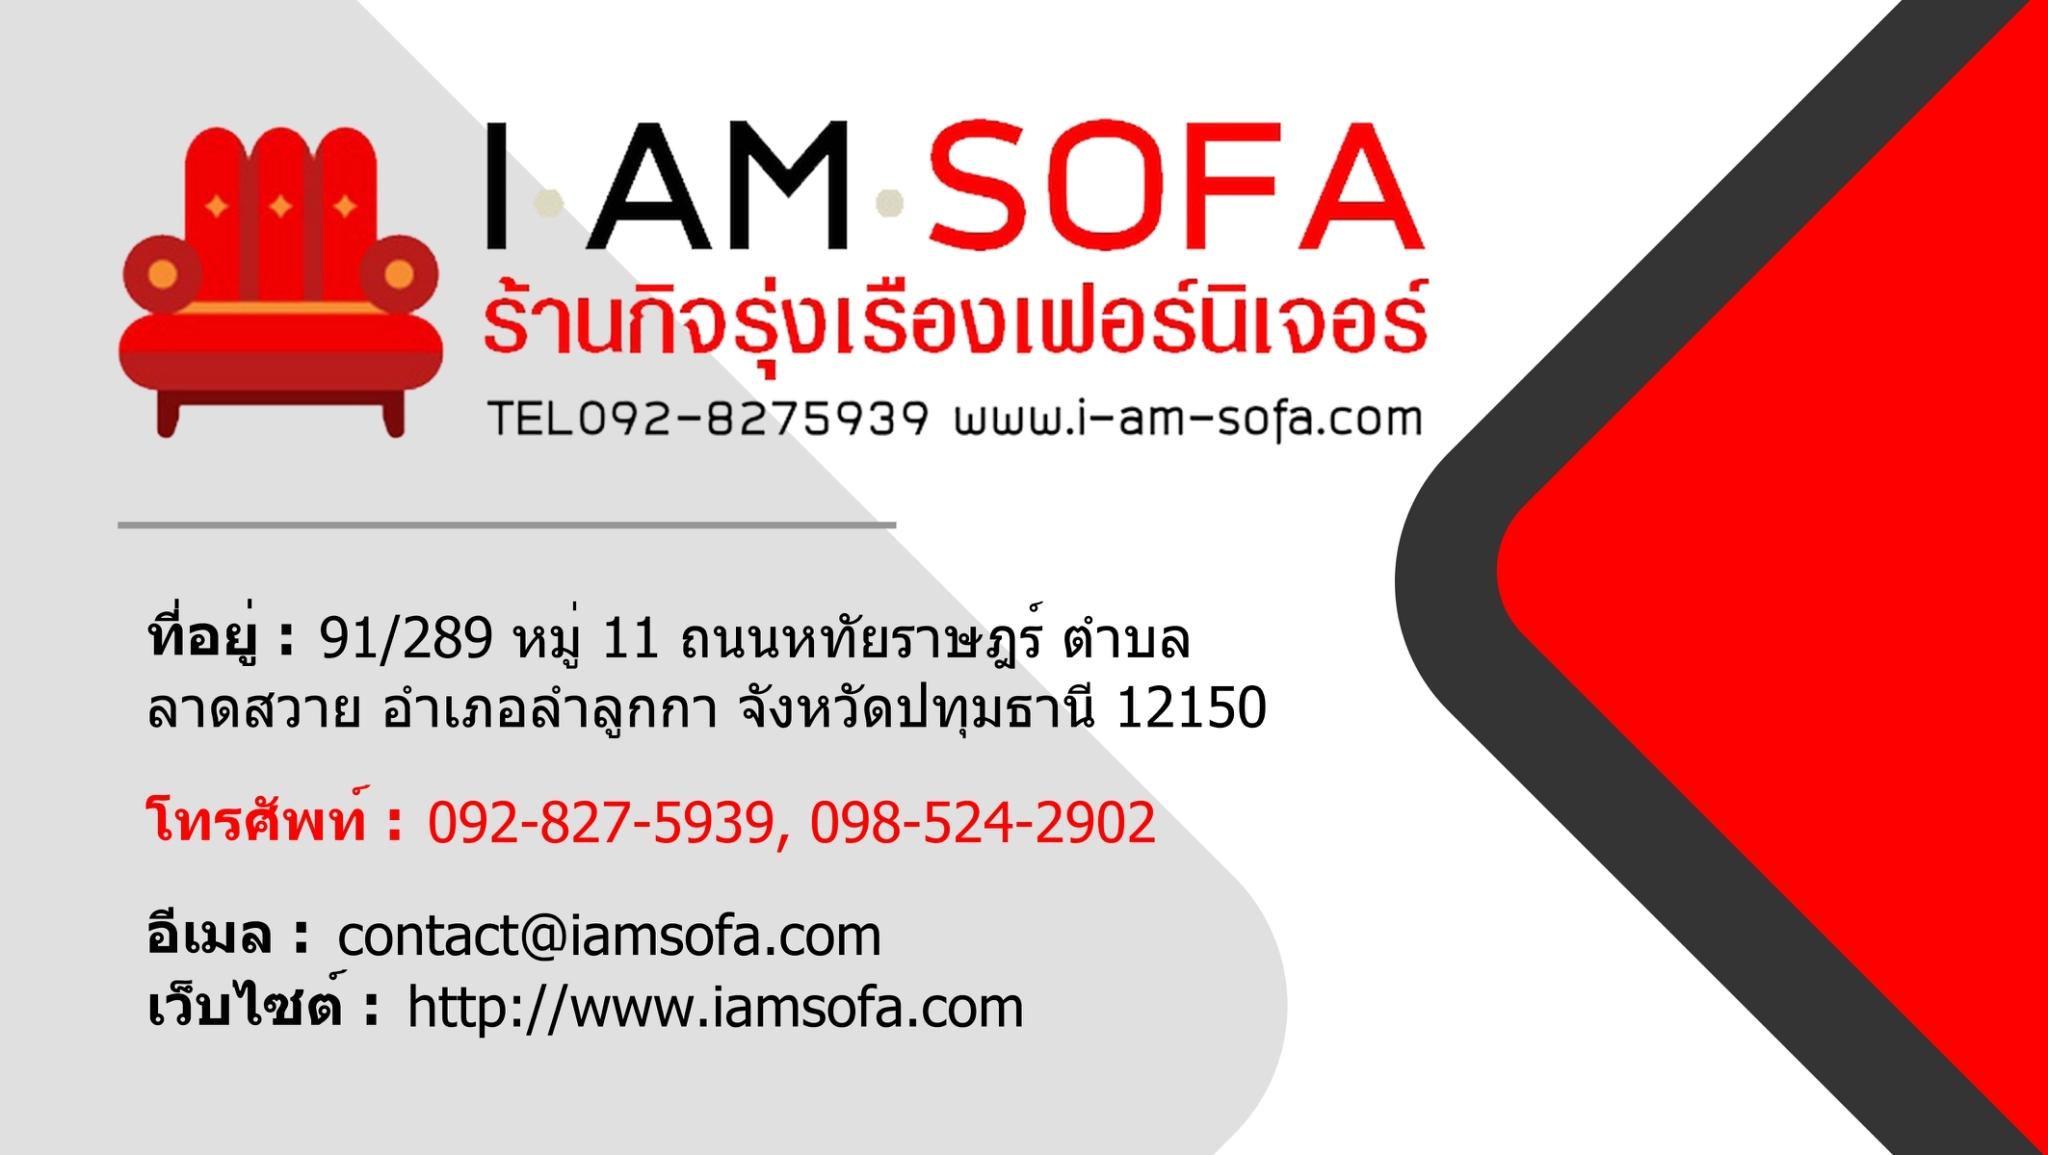 I am sofa